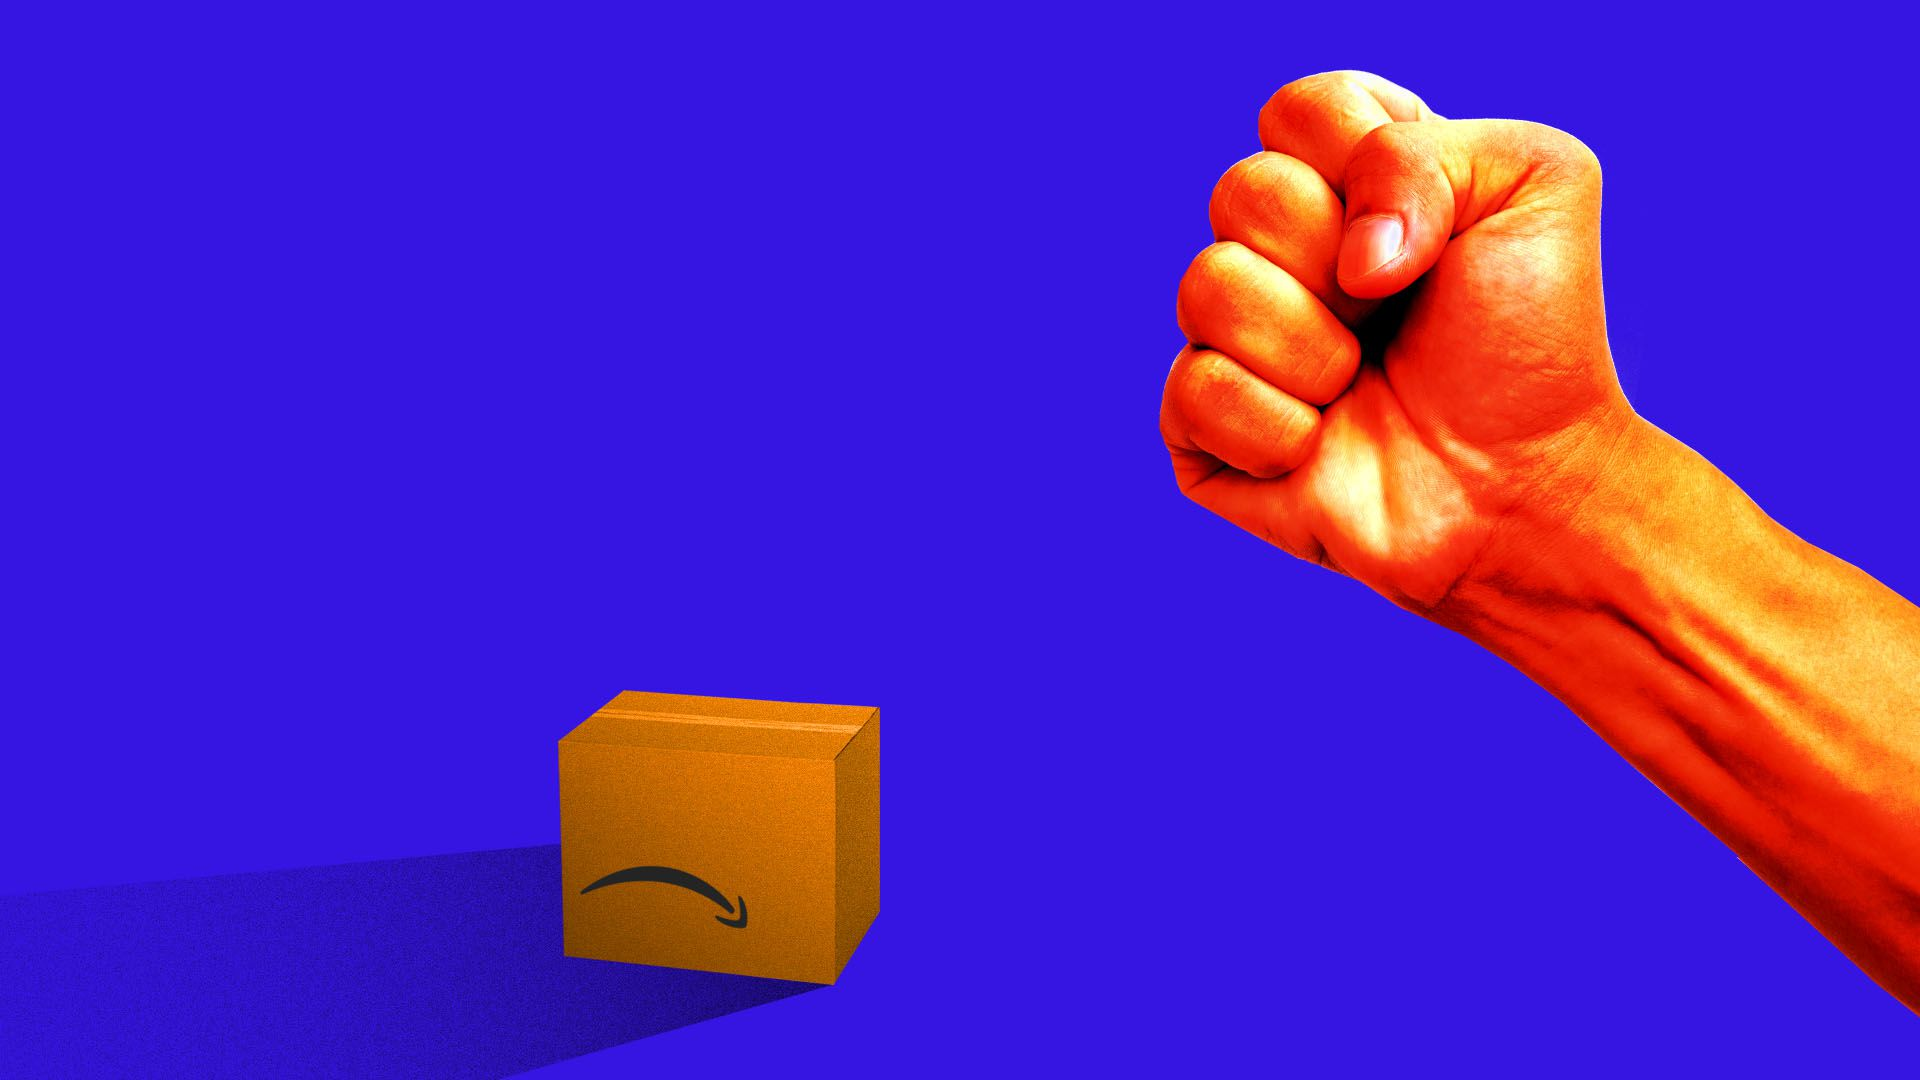 Illustration of fist shaking at sad Amazon box